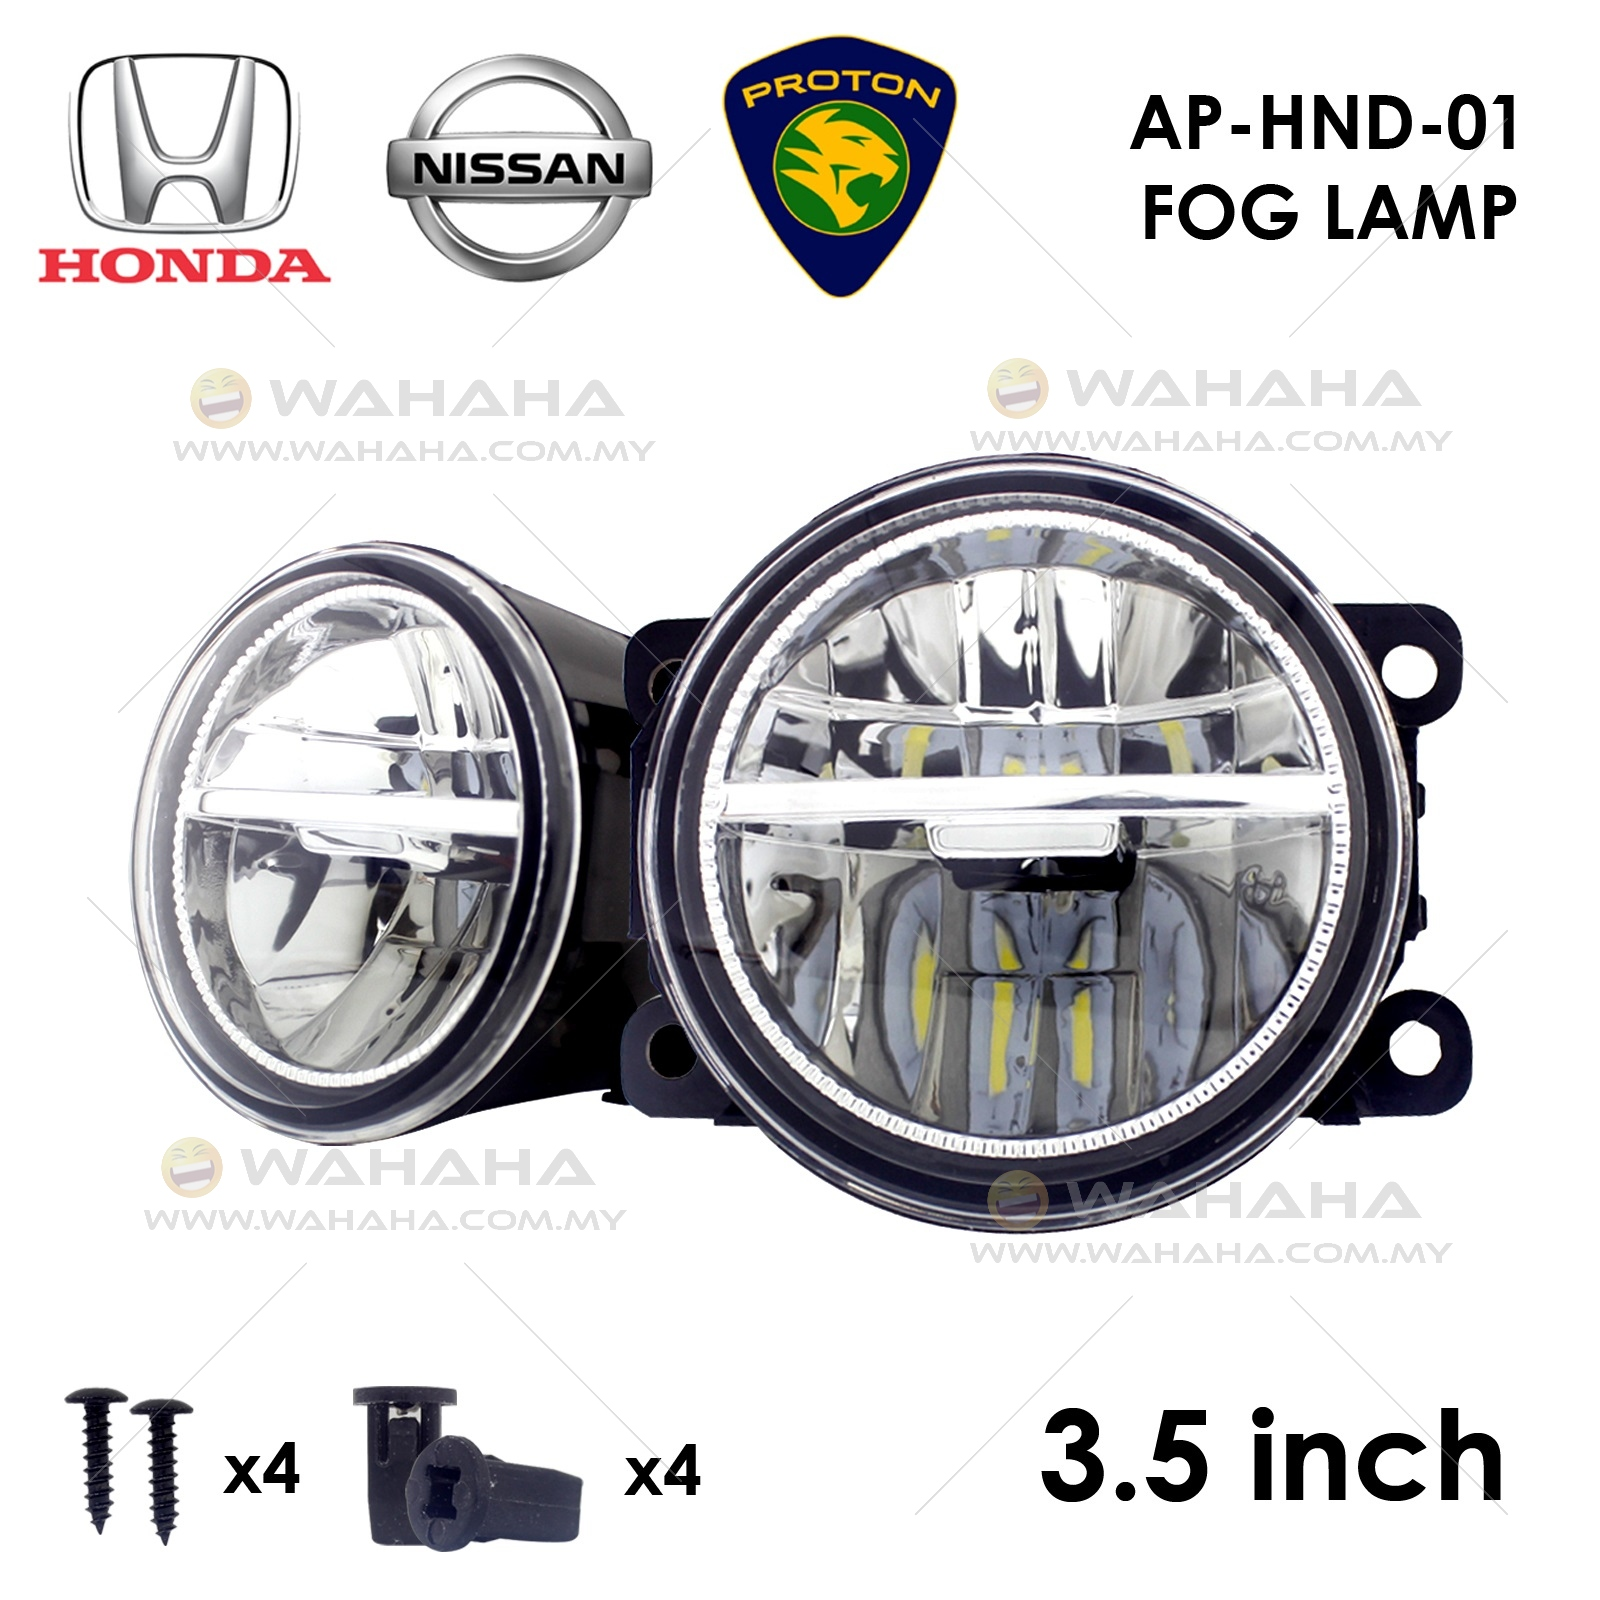 89mm 35 Led Sportlight Fog Lamp End 2 27 2021 1200 Am Wiring Lampu Tl X 1 Pair For Honda Nissan Proton